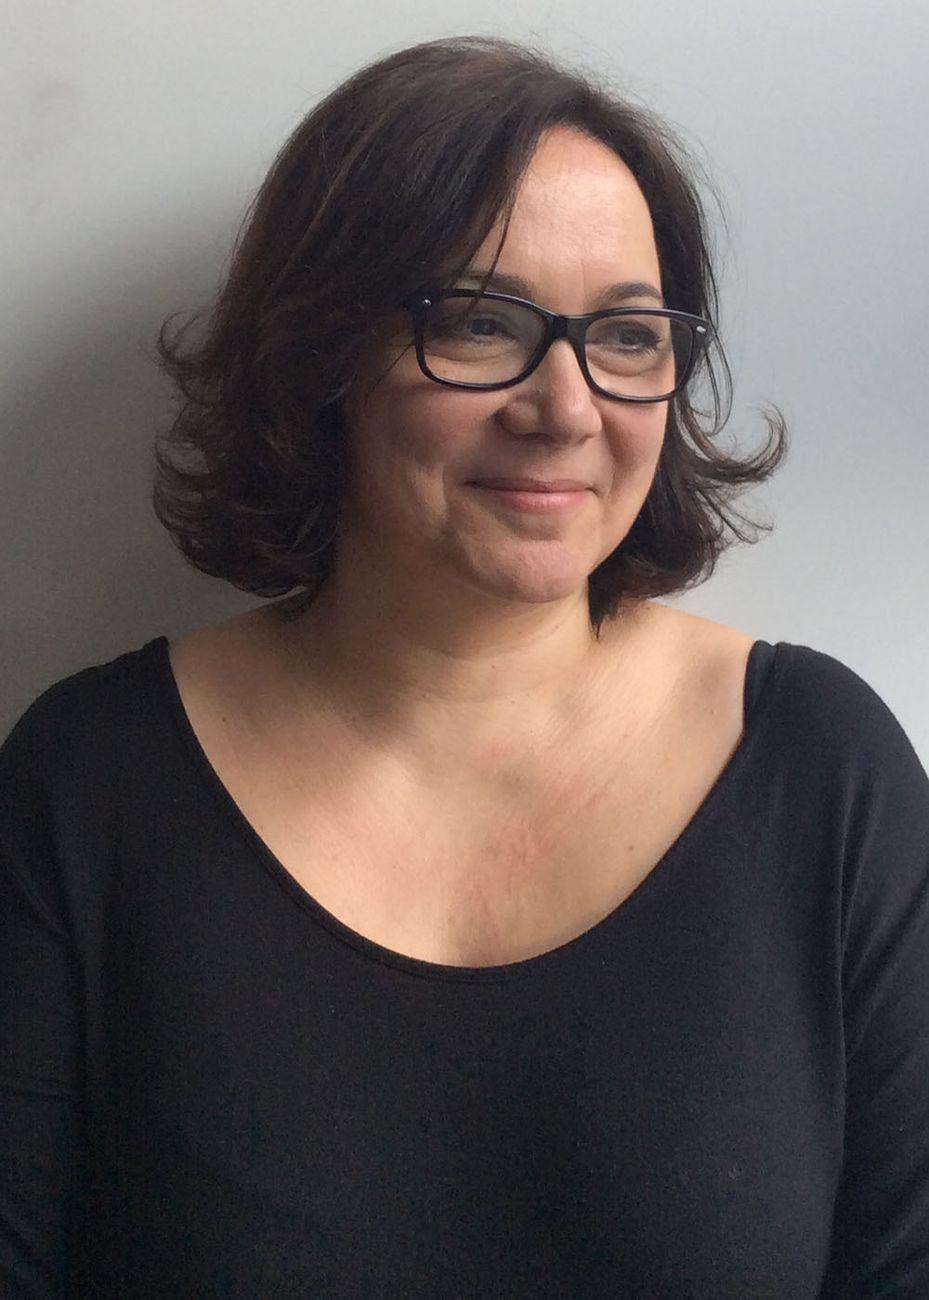 Silvia Botti